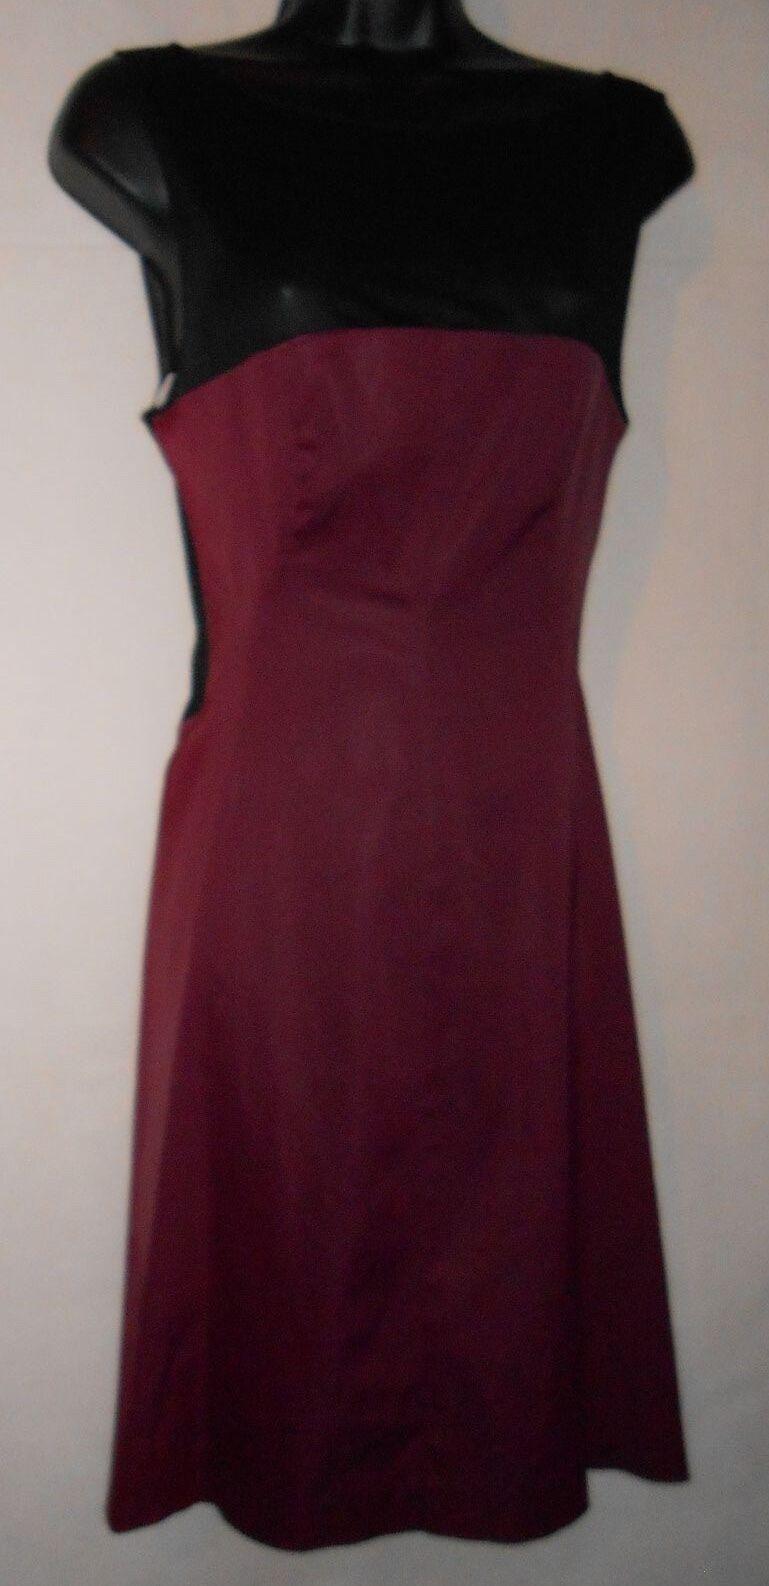 New John Richmond purple dress IT42, IT42, IT42, UK10 RRP 824fcc